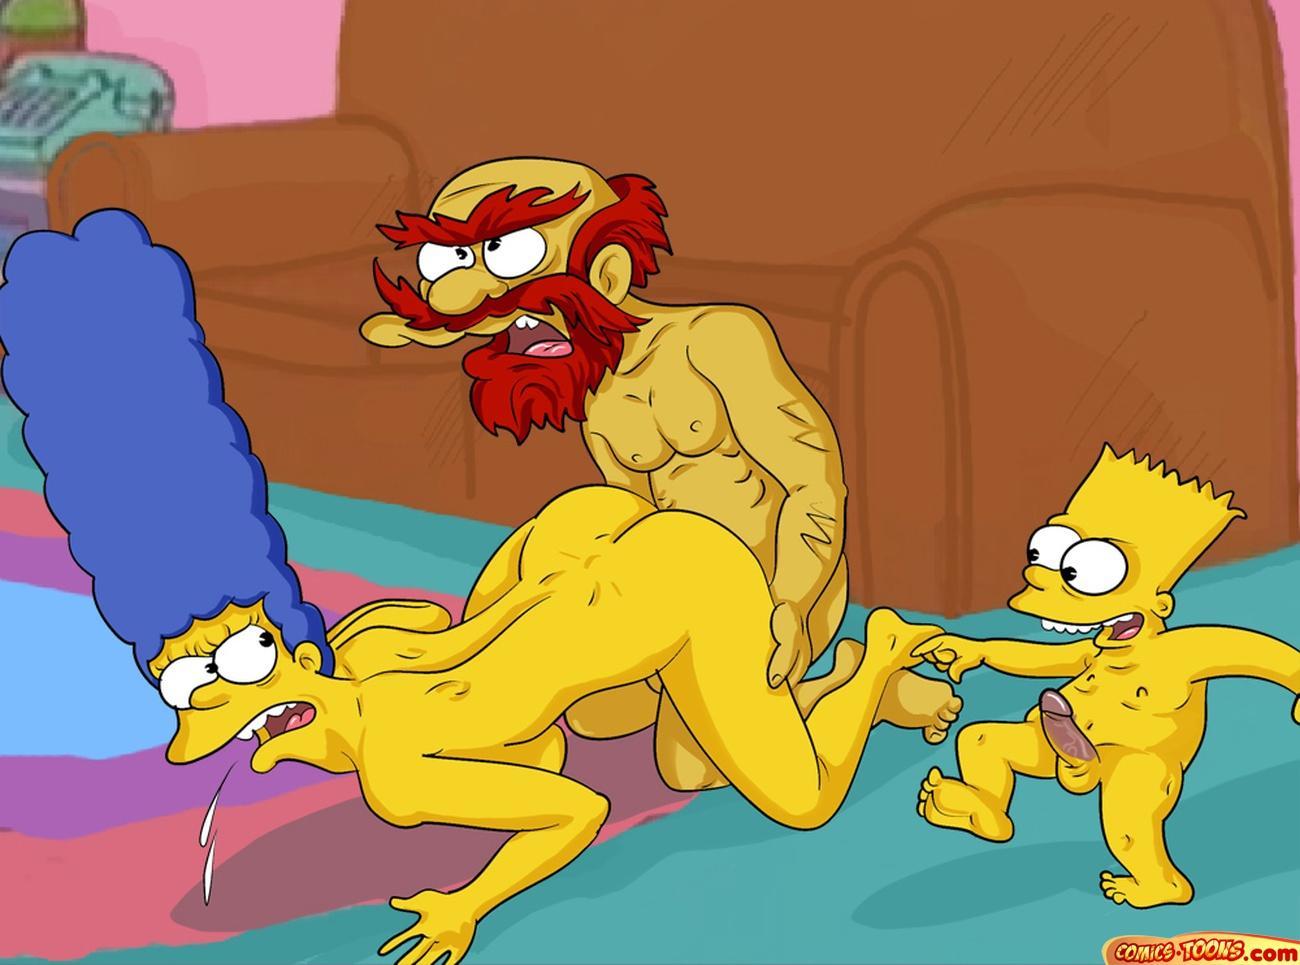 трахает секс мультики мардж комикс барт